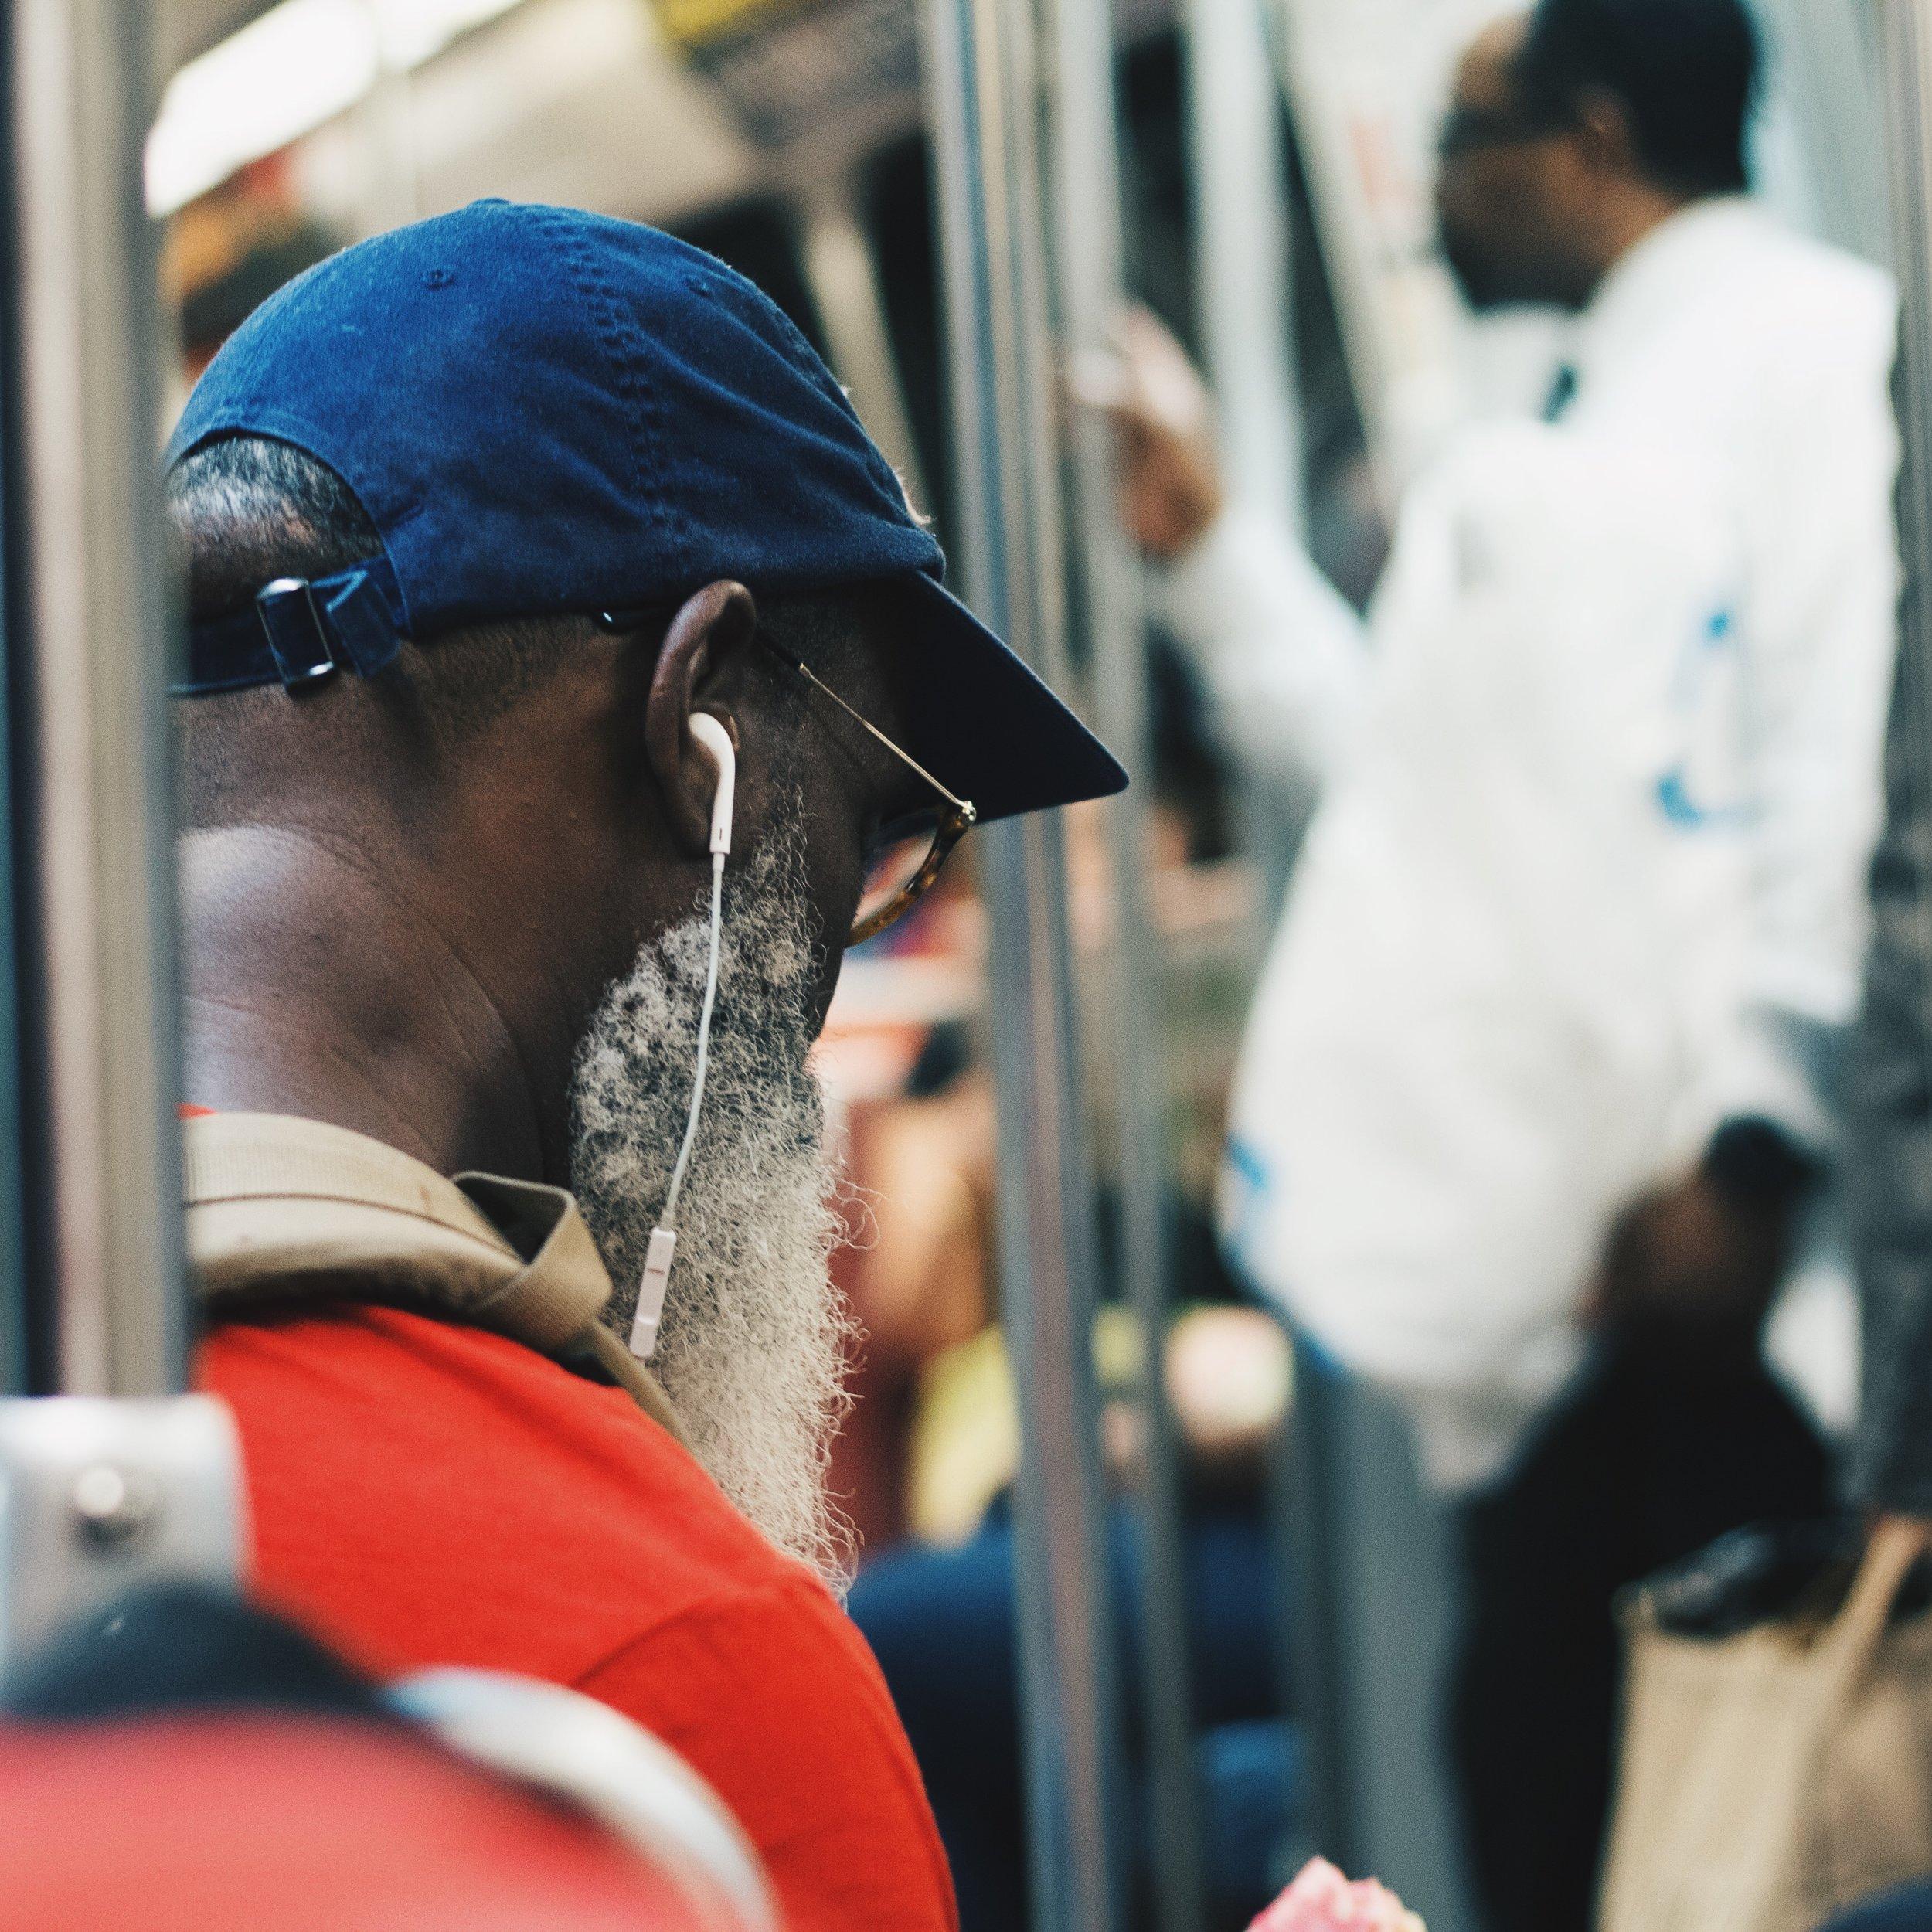 dc_black man_metro_gray_beard.jpeg